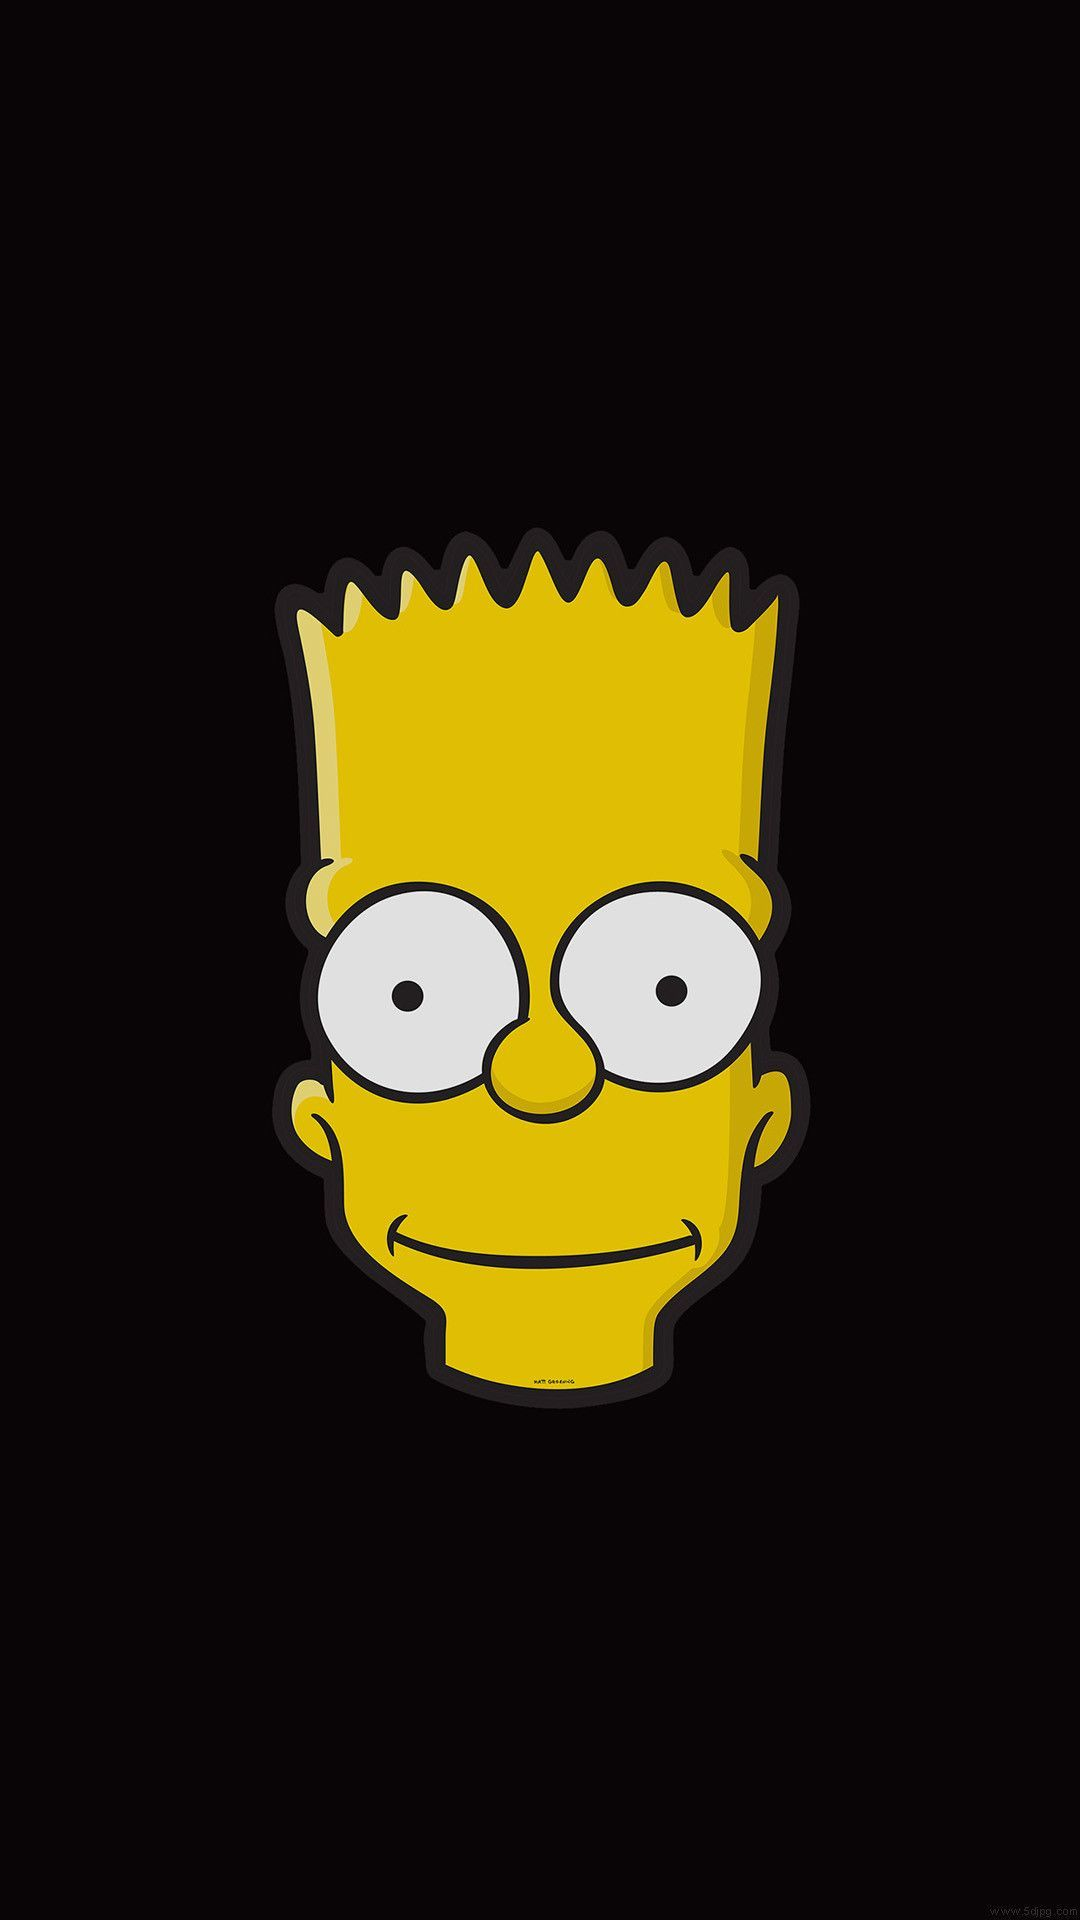 Simpsons Wallpaper Download Flip Wallpapers Download Free Wallpaper Hd In 2020 Simpson Wallpaper Iphone Bart Simpson Art The Simpsons